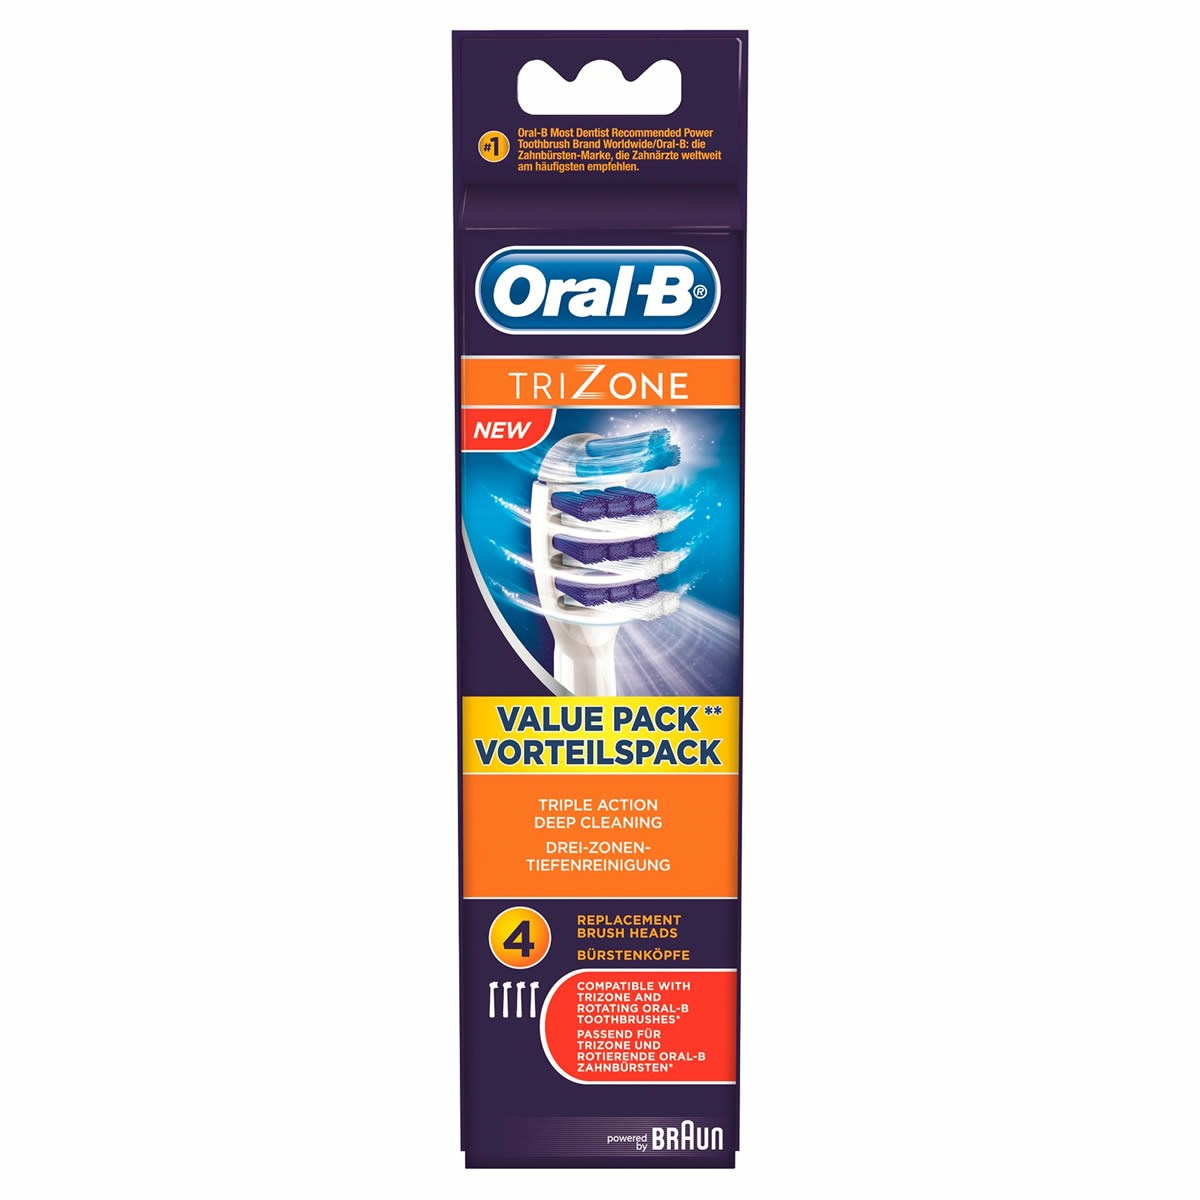 Oral-B TriZone Replacement Brush Heads